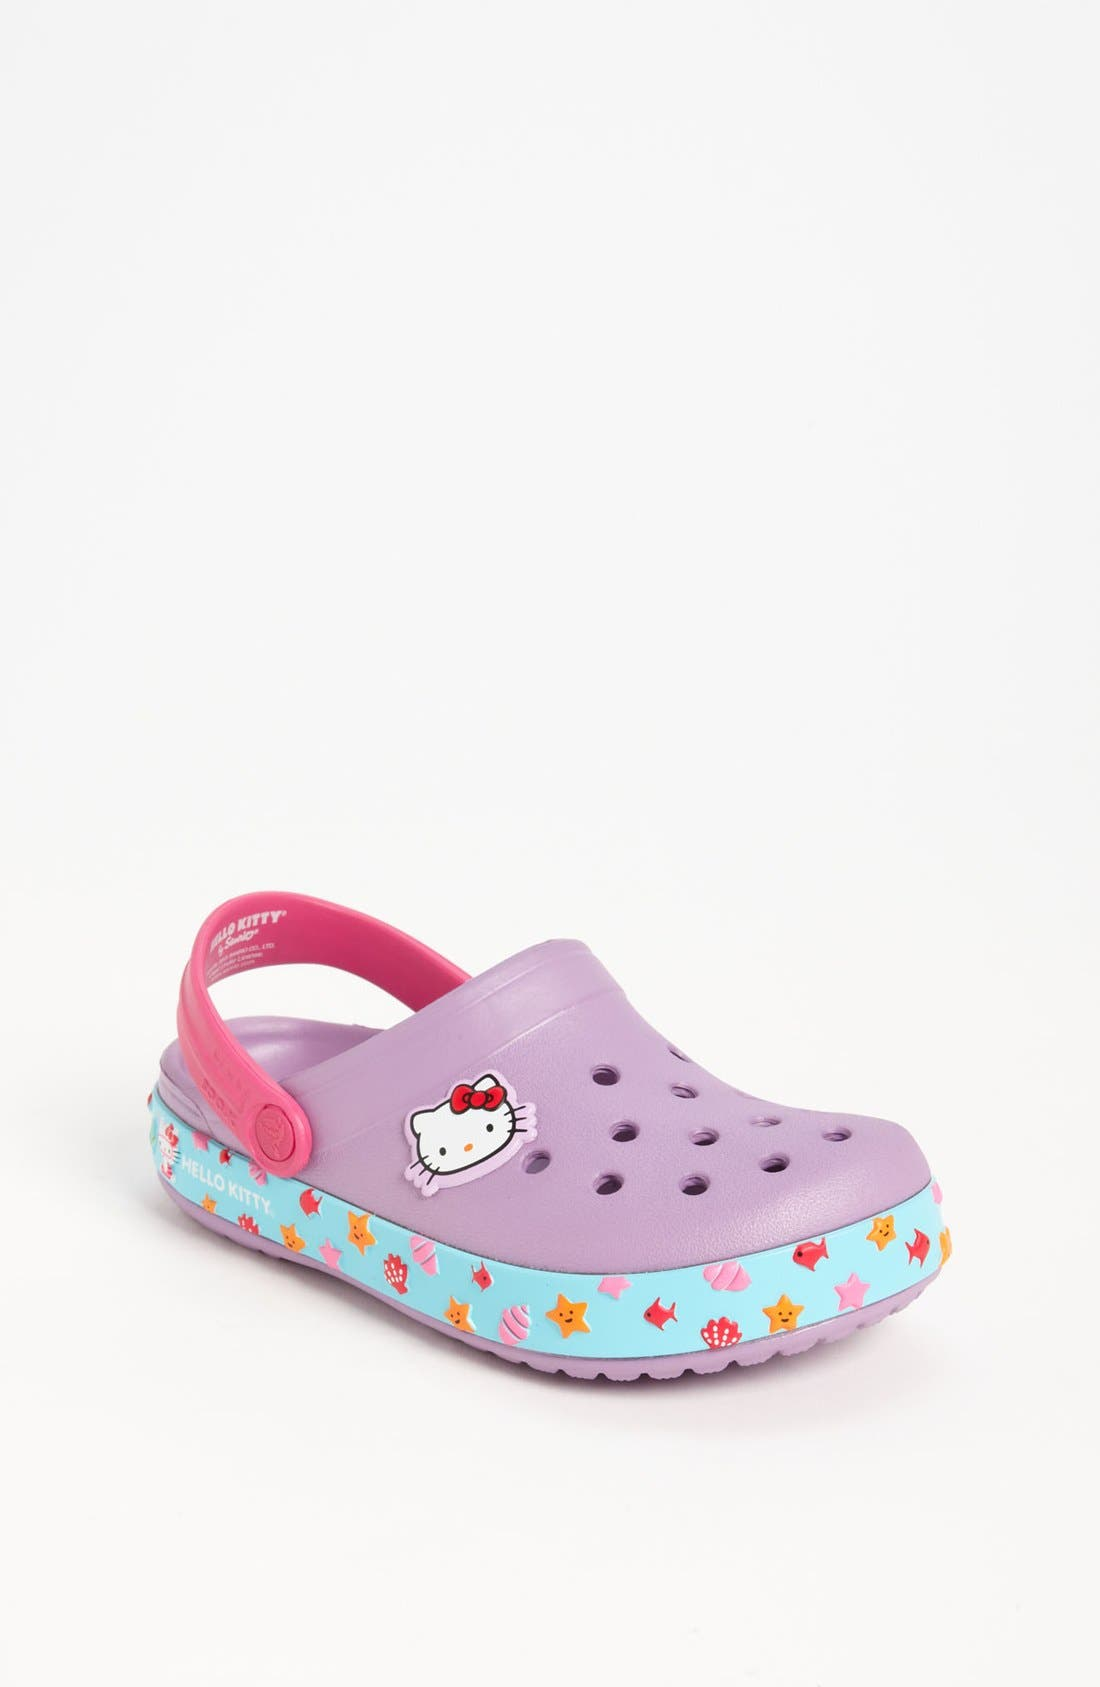 Alternate Image 1 Selected - CROCS™ 'Hello Kitty® - Mermaid' Slip-On (Walker & Toddler)